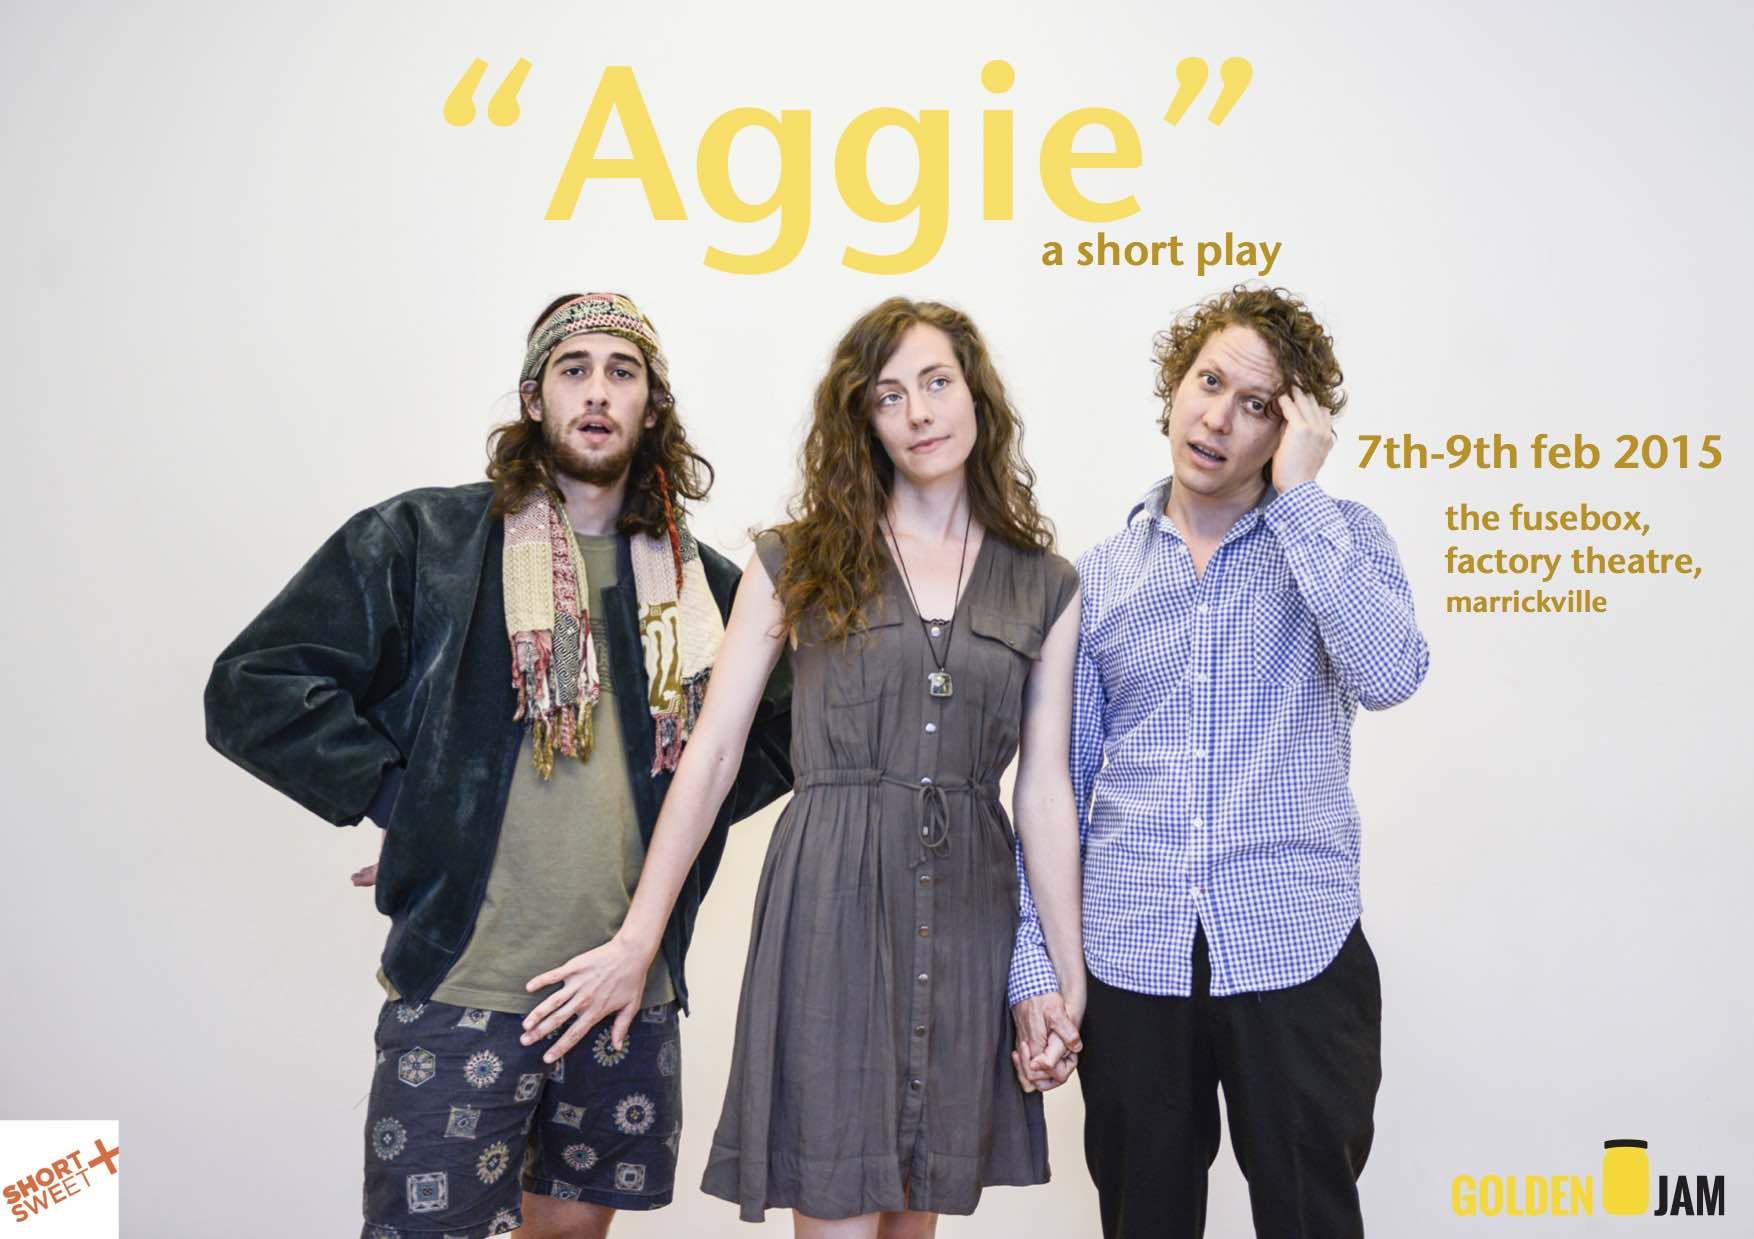 Aggie poster 3.jpg